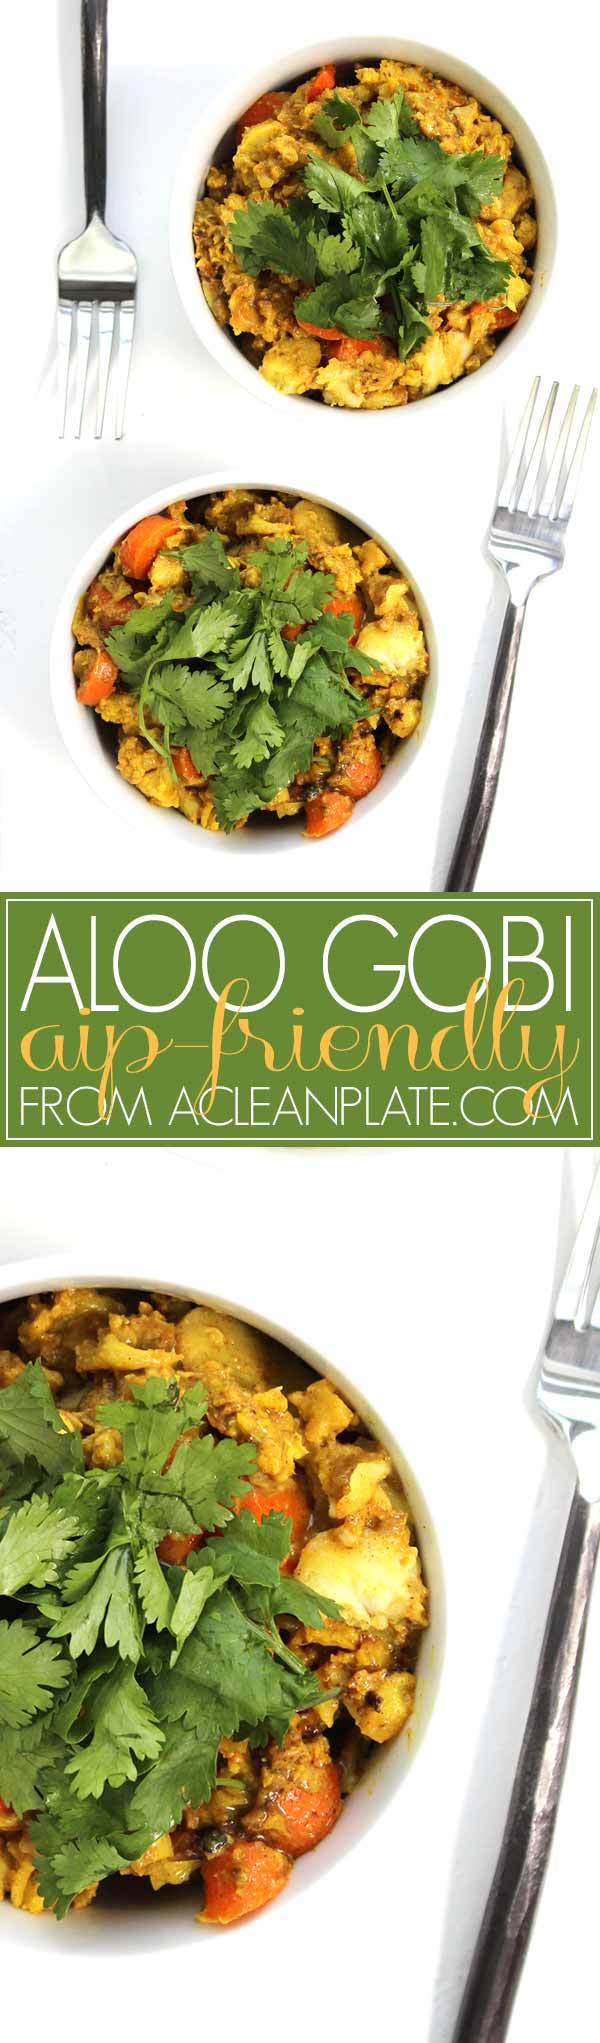 AIP Aloo Gobi recipe from acleanplate.com